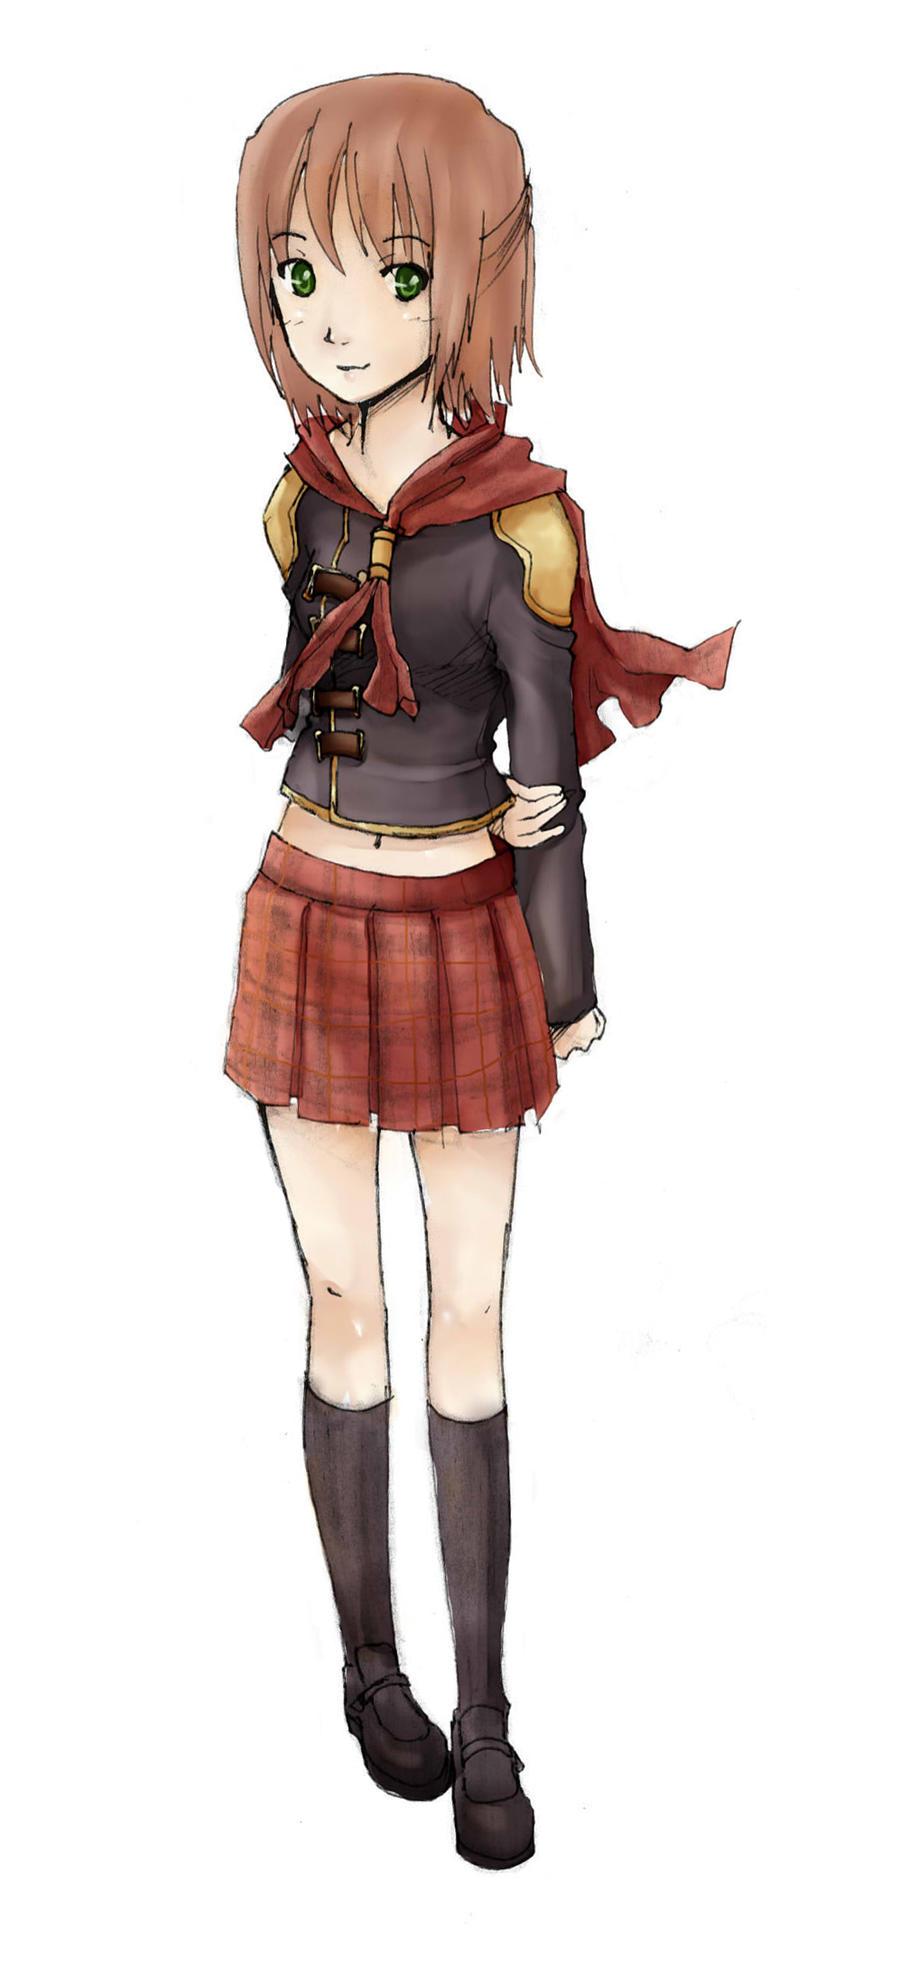 FFXIII Type-0 by akatsukiRei